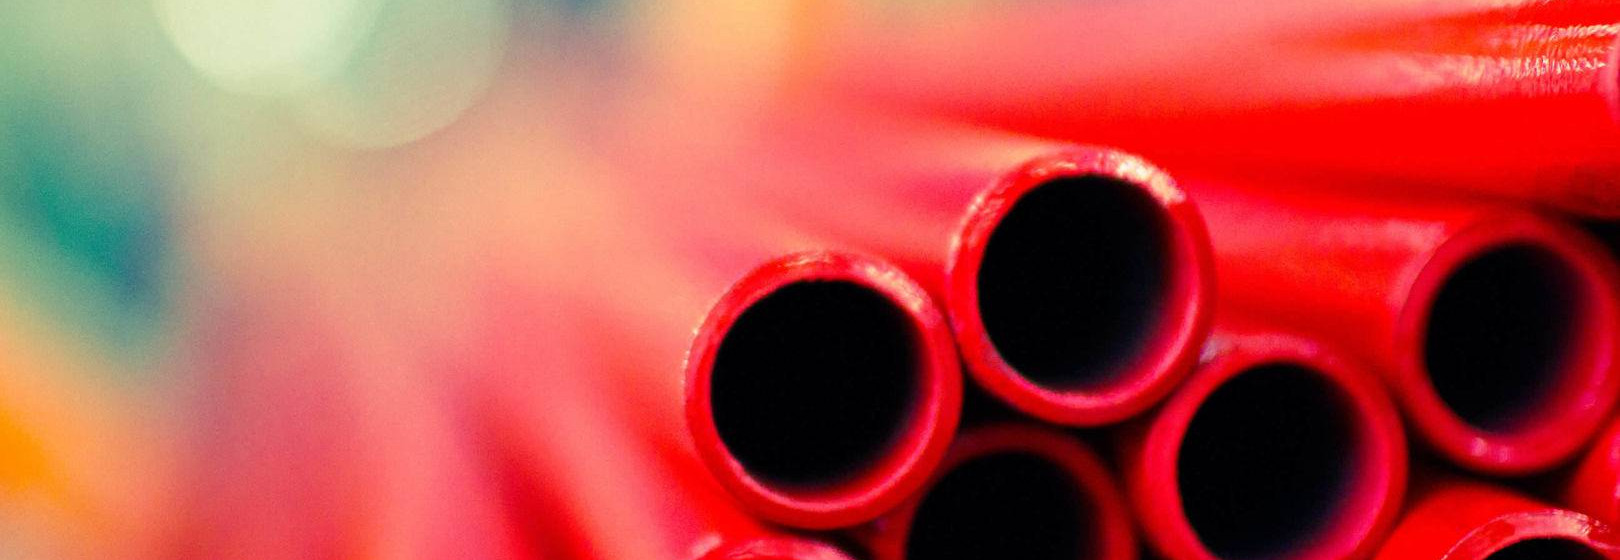 Finiture dei tubi di acciaio presso Acciaitubi